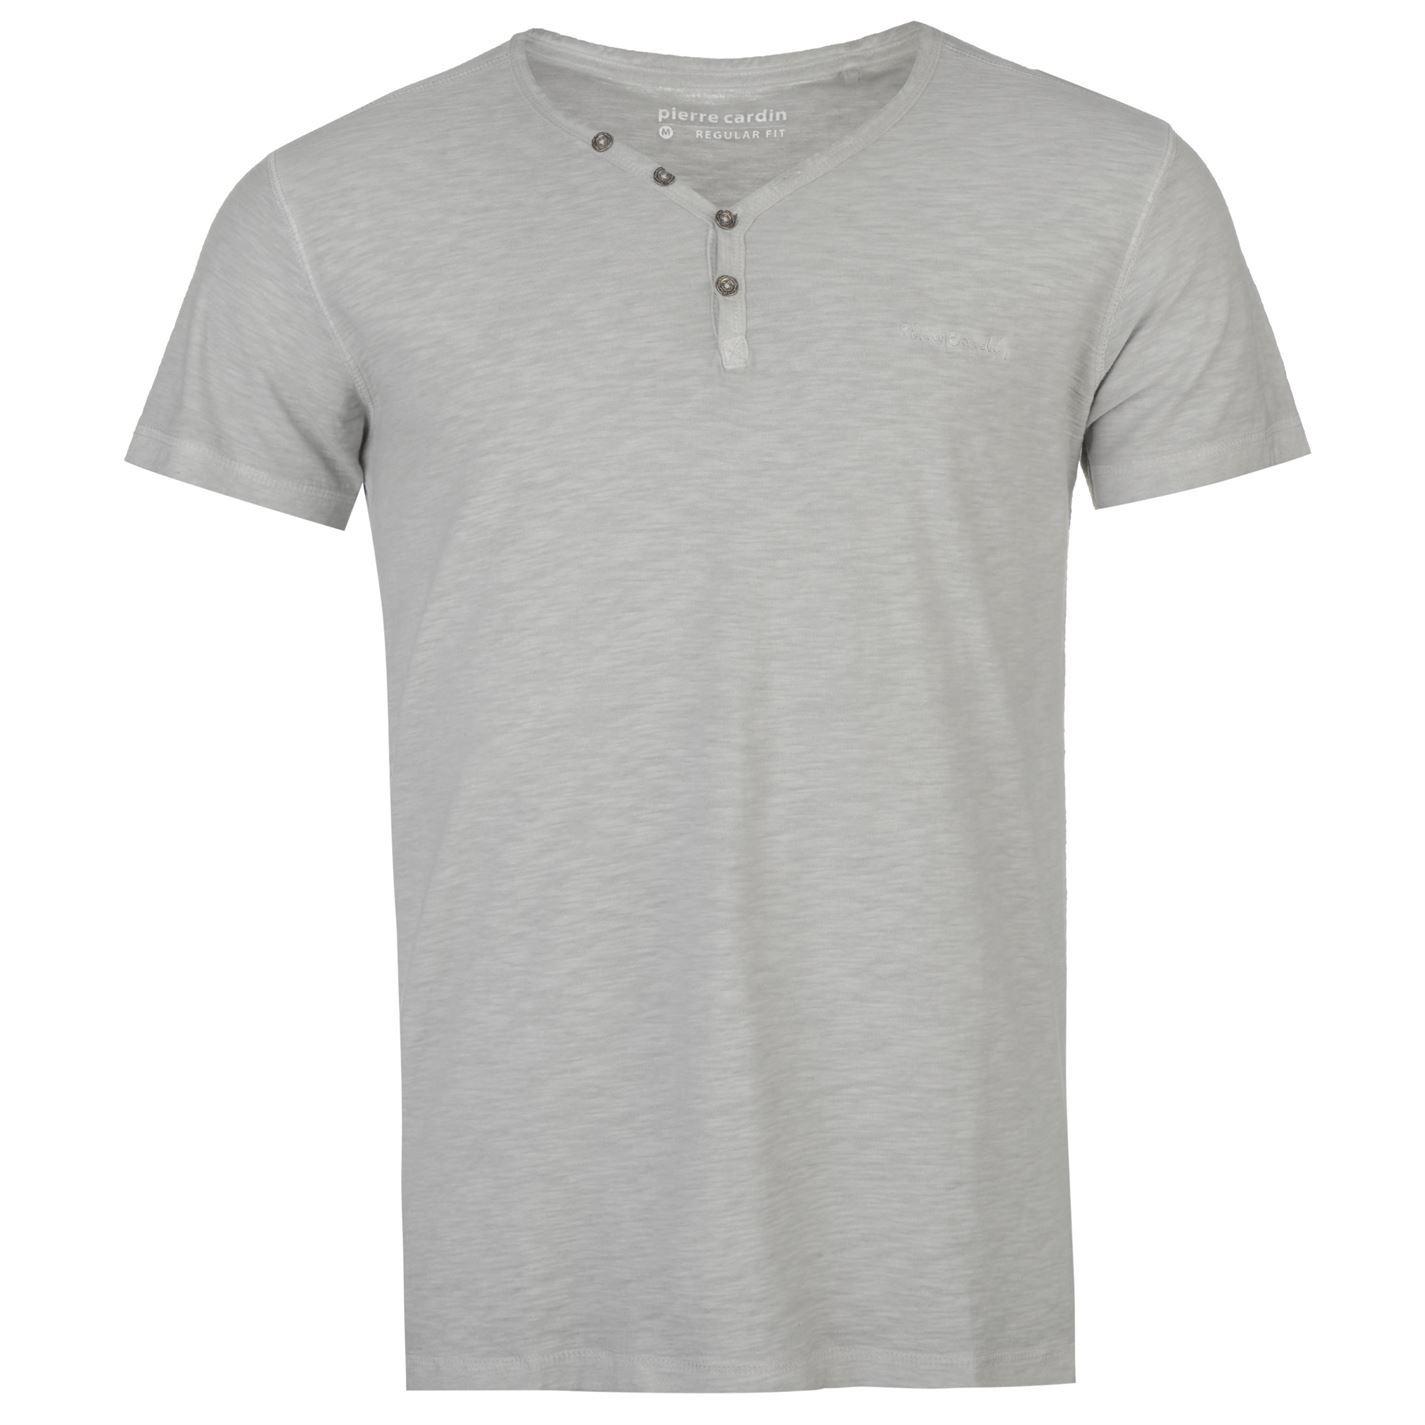 pierre cardin mens short sleeve henley t shirt grandad. Black Bedroom Furniture Sets. Home Design Ideas